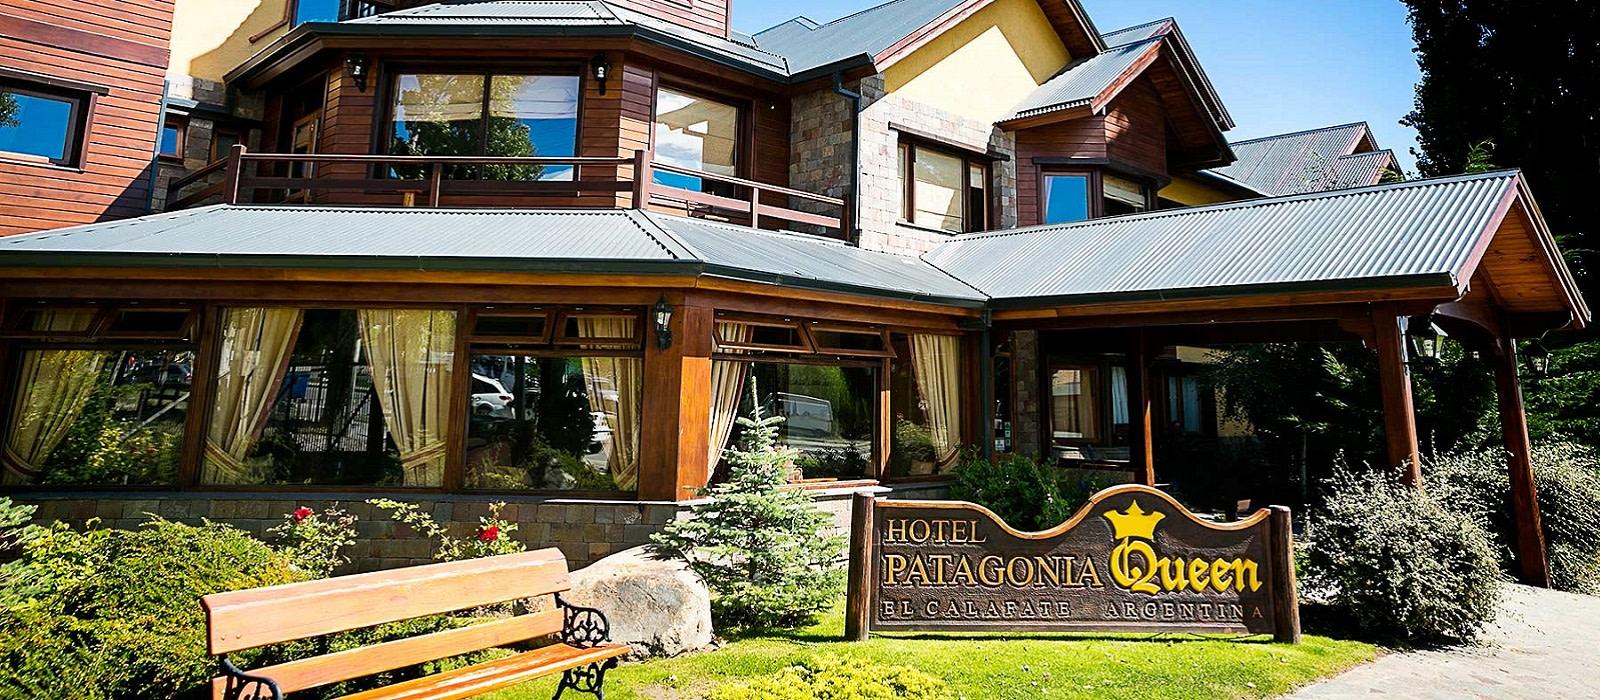 Hotel Patagonia Queen Argentinien